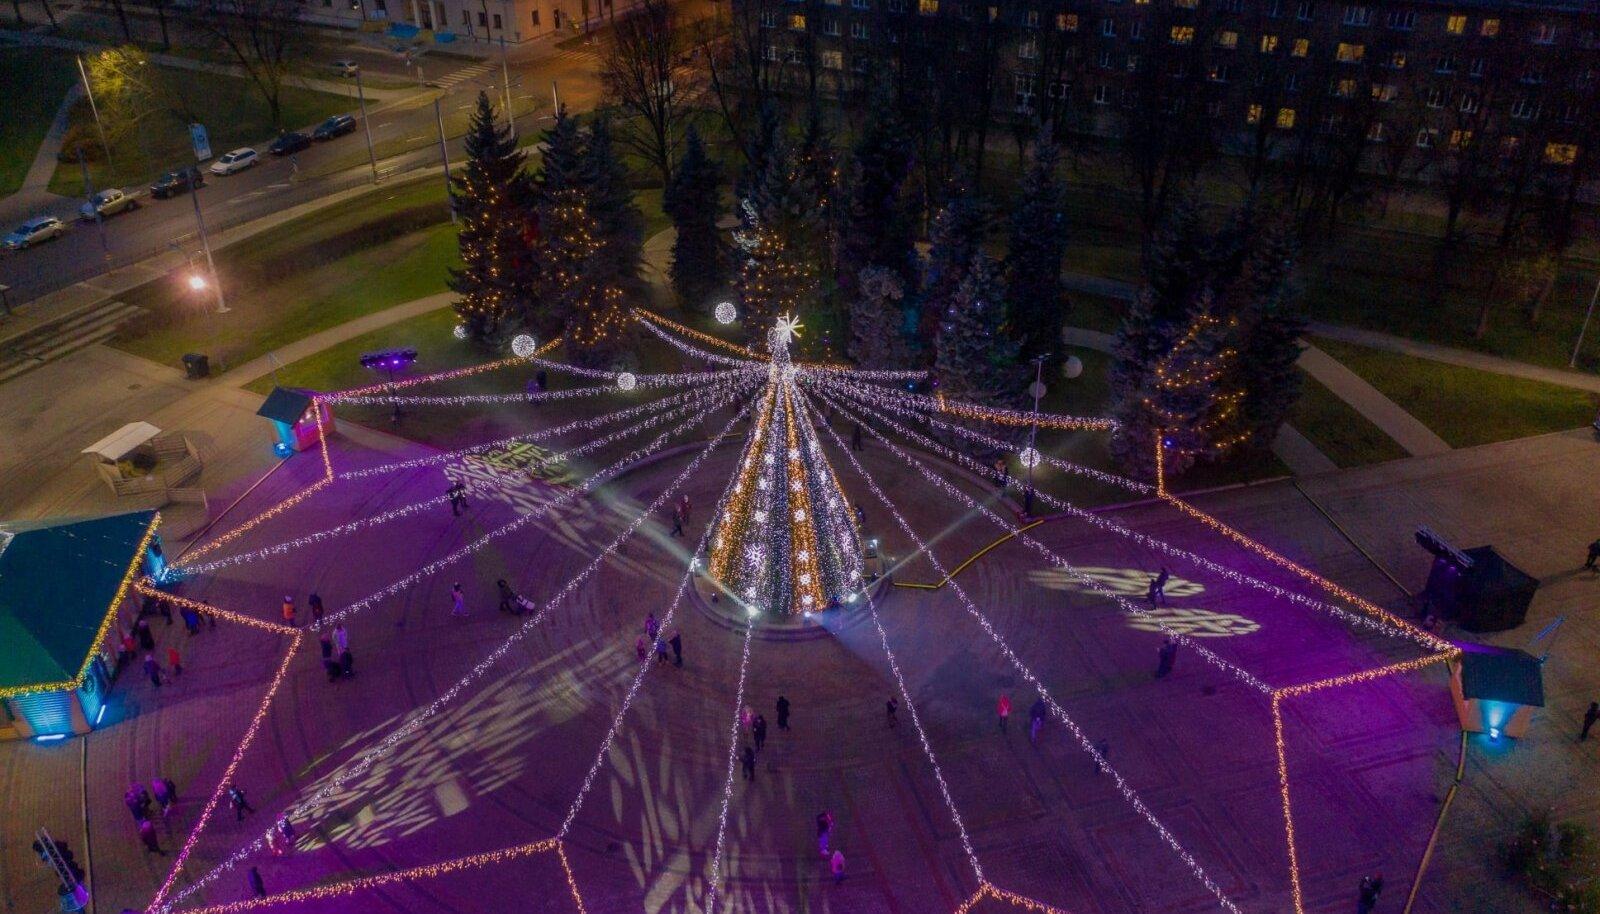 Daugavpilsi jõulupuu